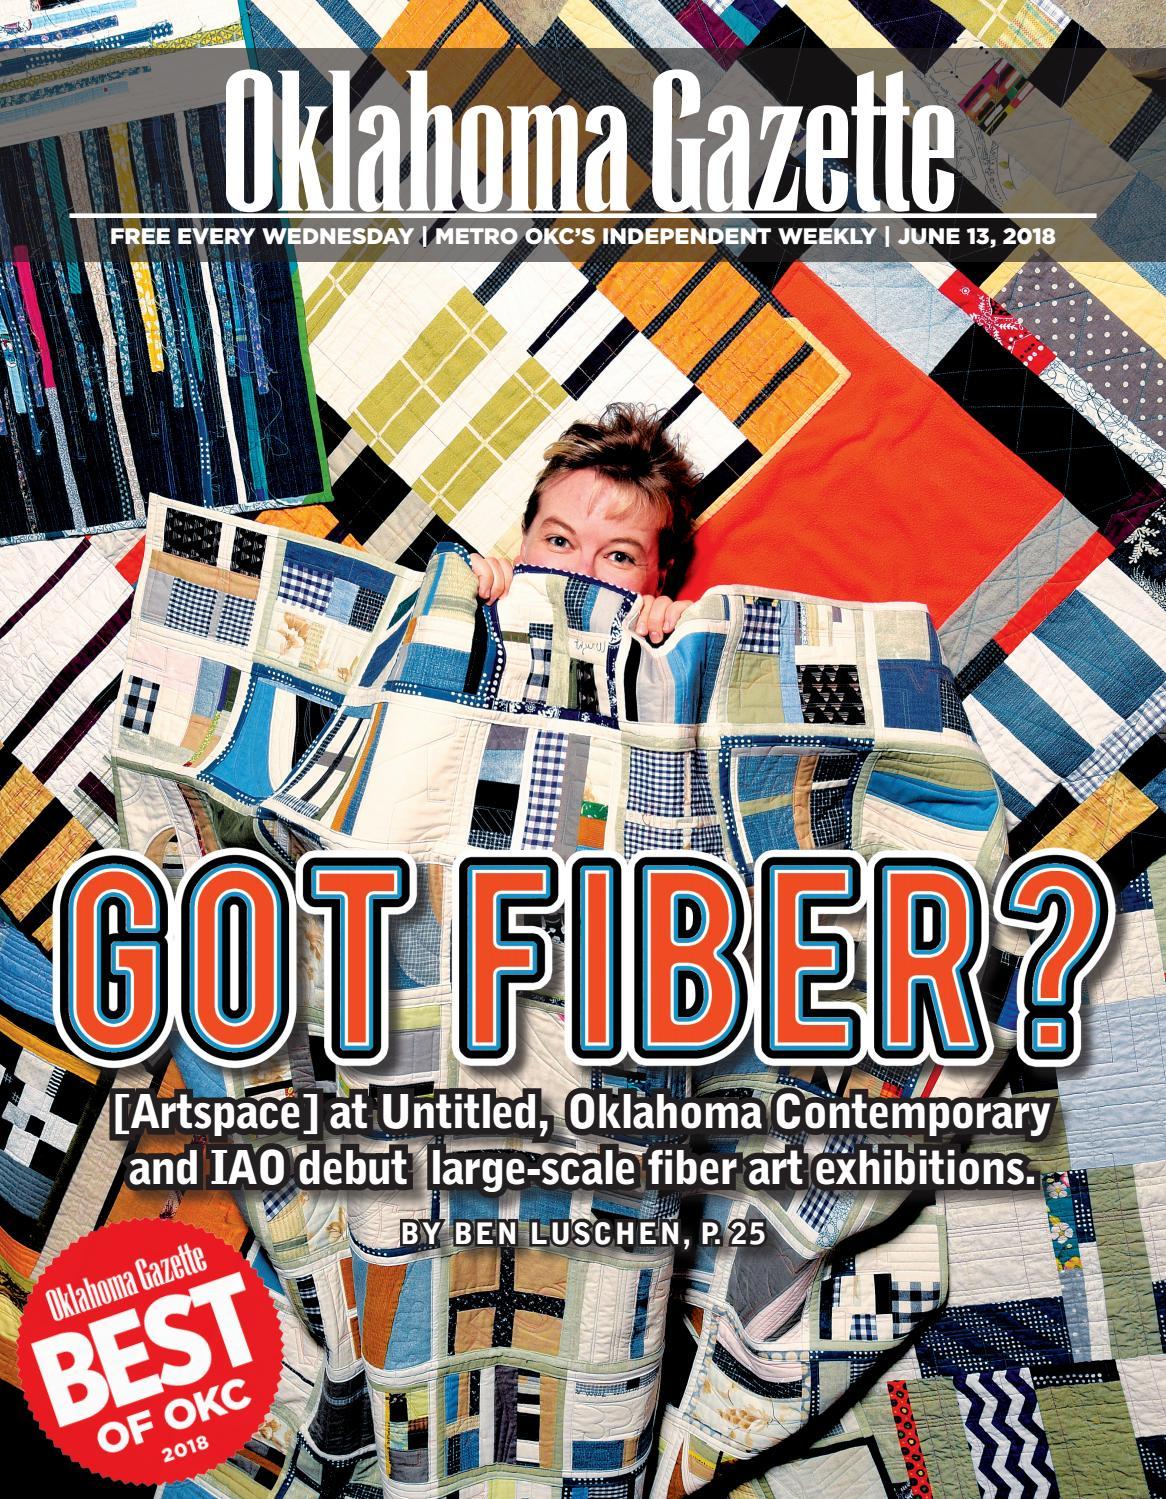 ad1e68c833b3 Got fiber  by Oklahoma Gazette - issuu